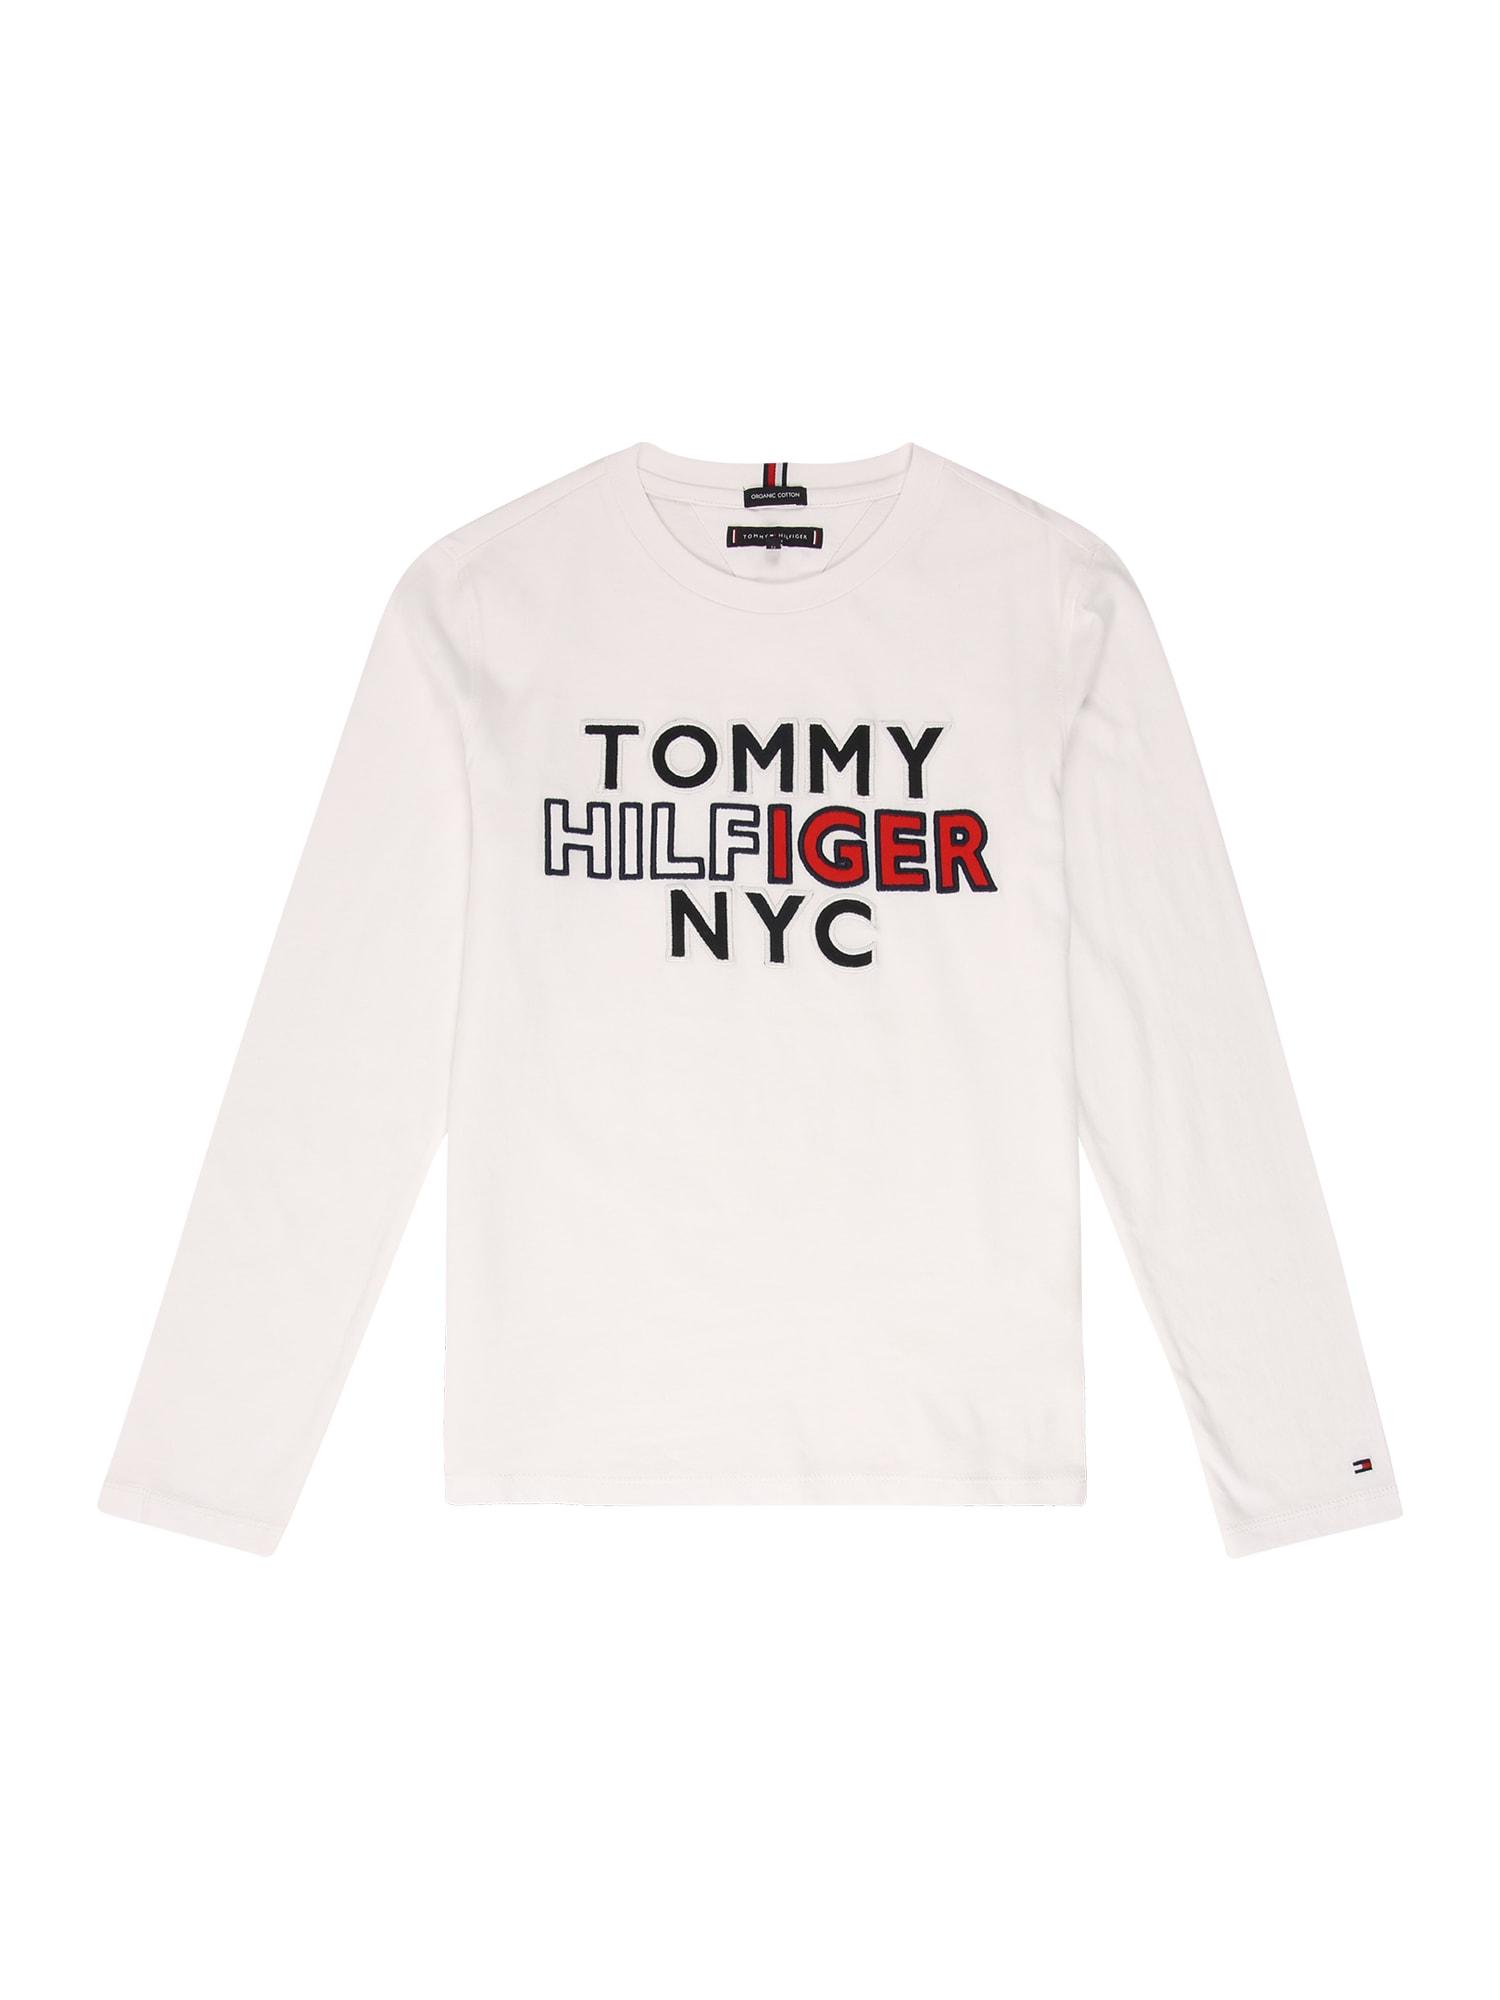 TOMMY HILFIGER Tričko  červená / bílá / marine modrá